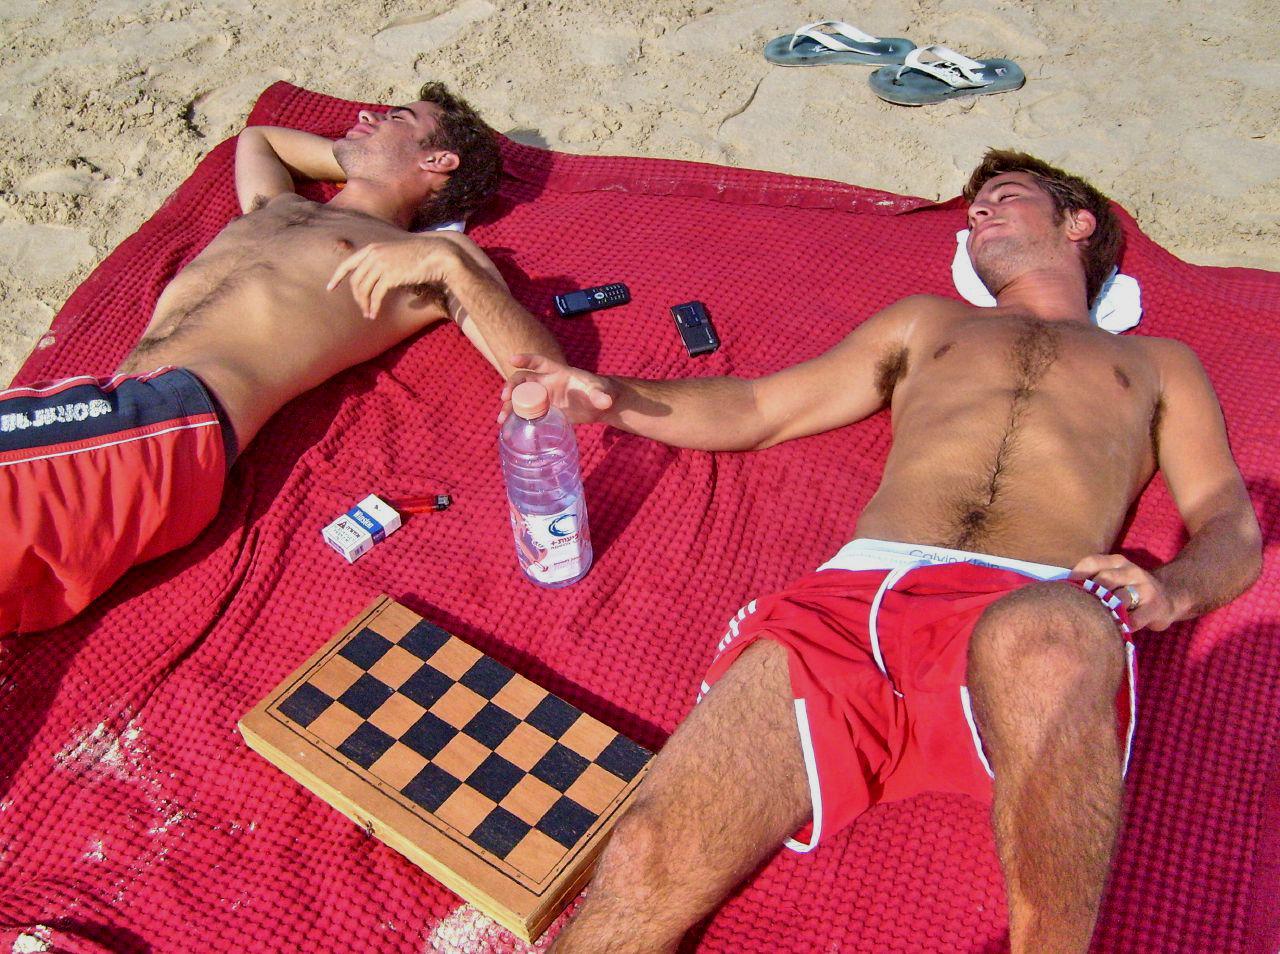 [Sunbathing_4_Non+nude.jpg]